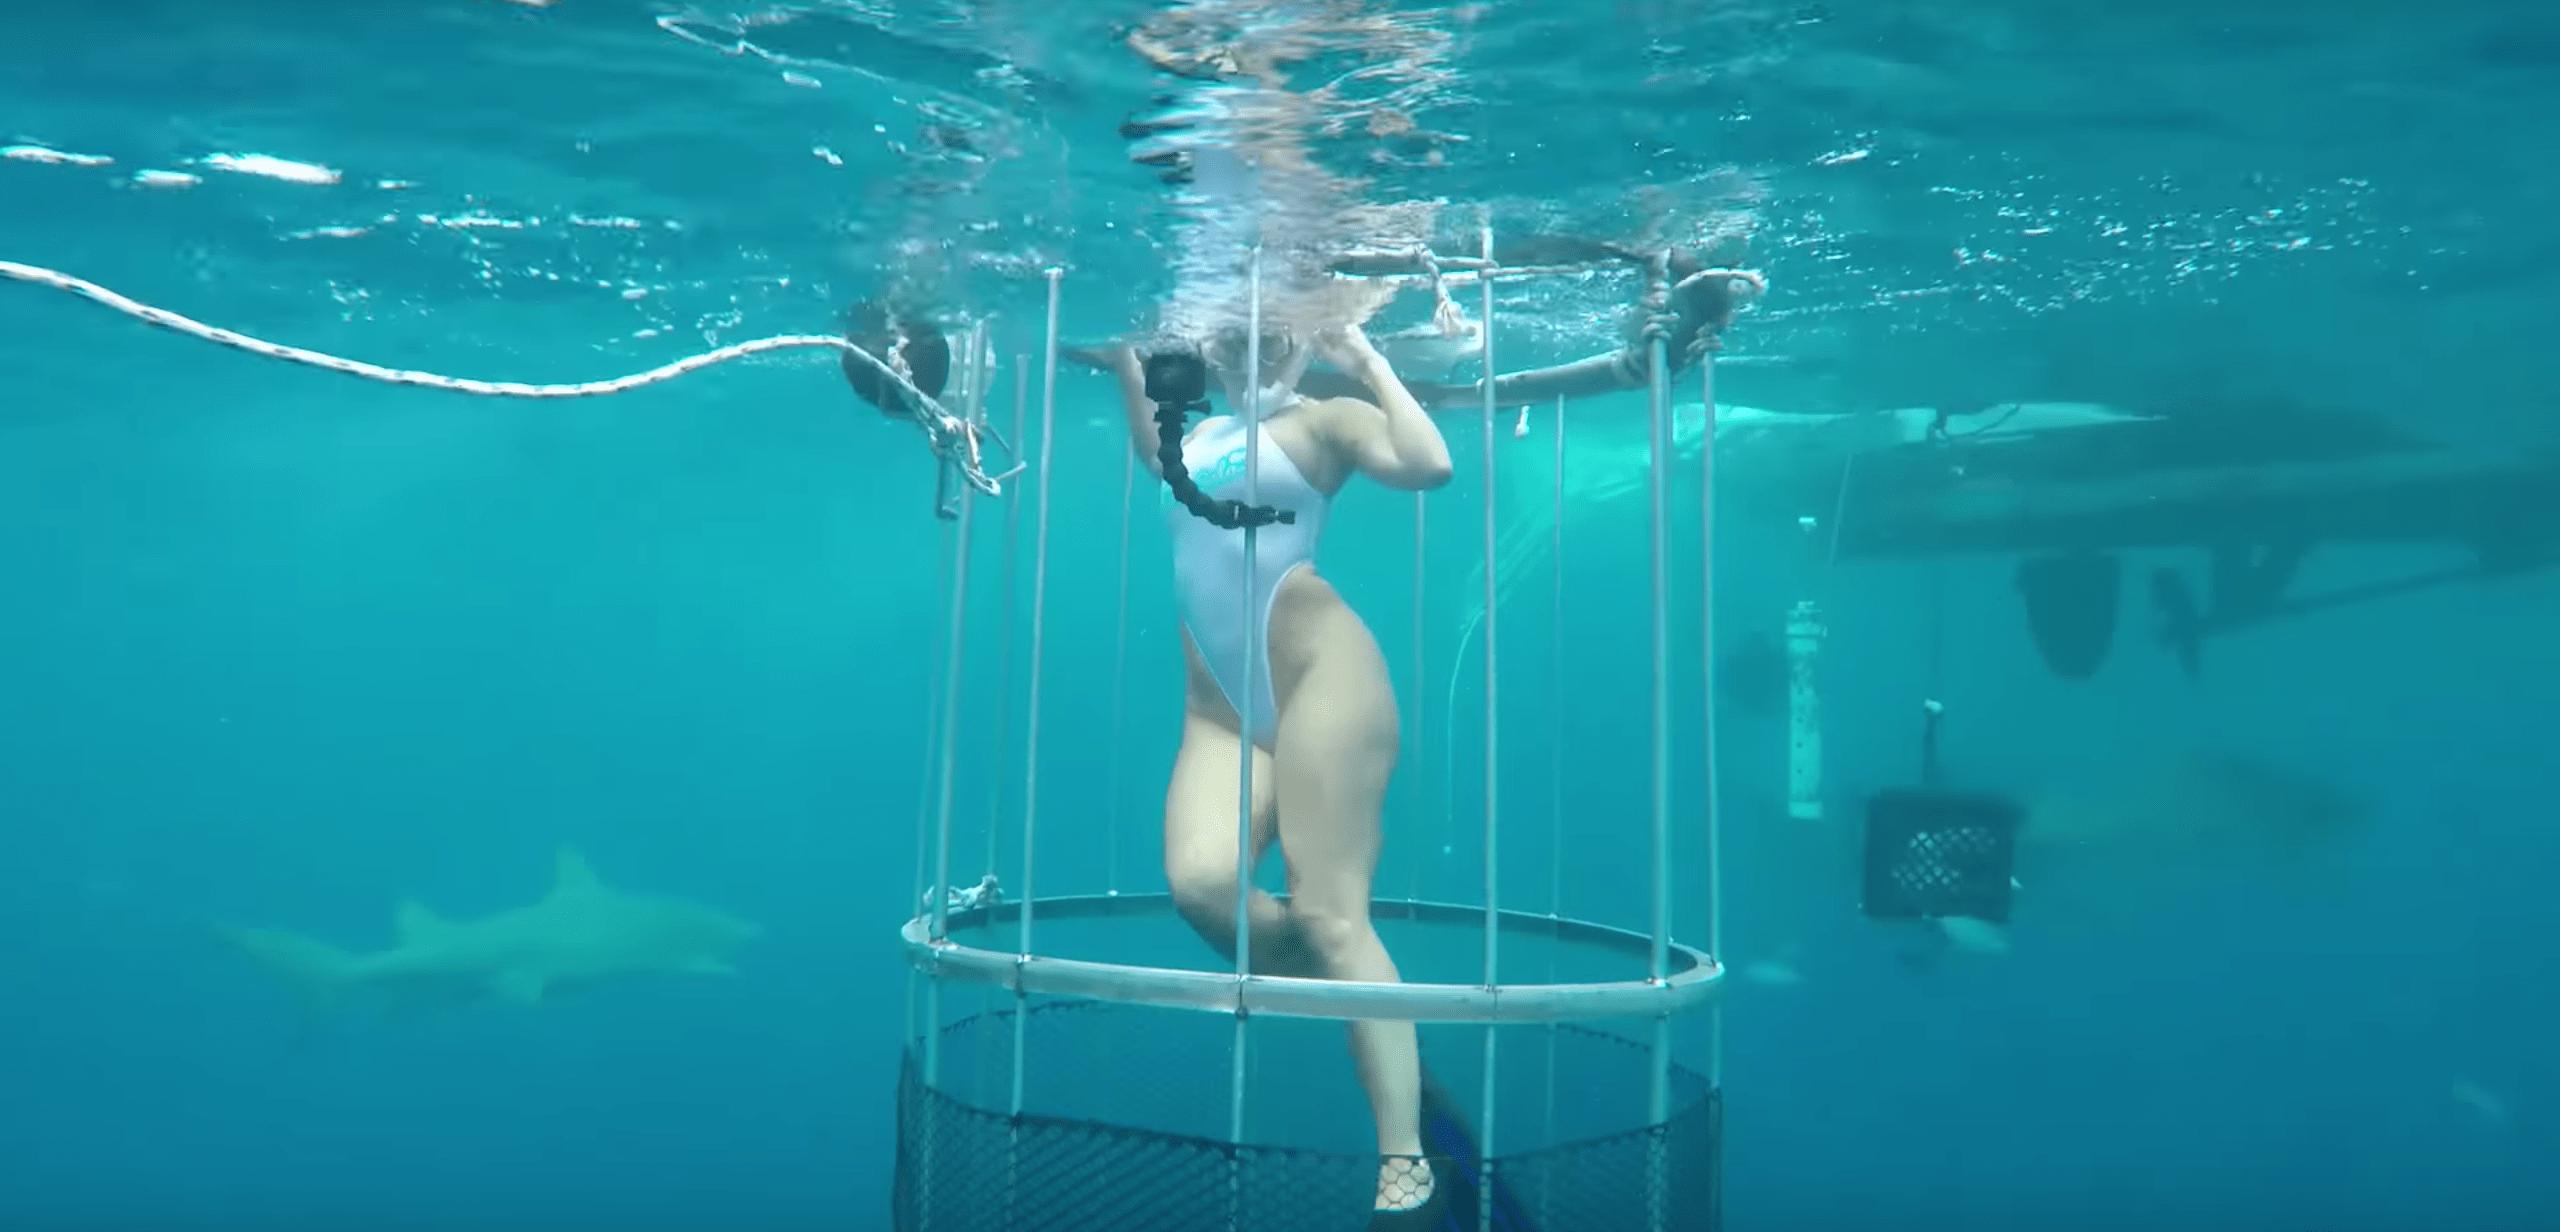 Movie shark adult, austin kincaid nude girl